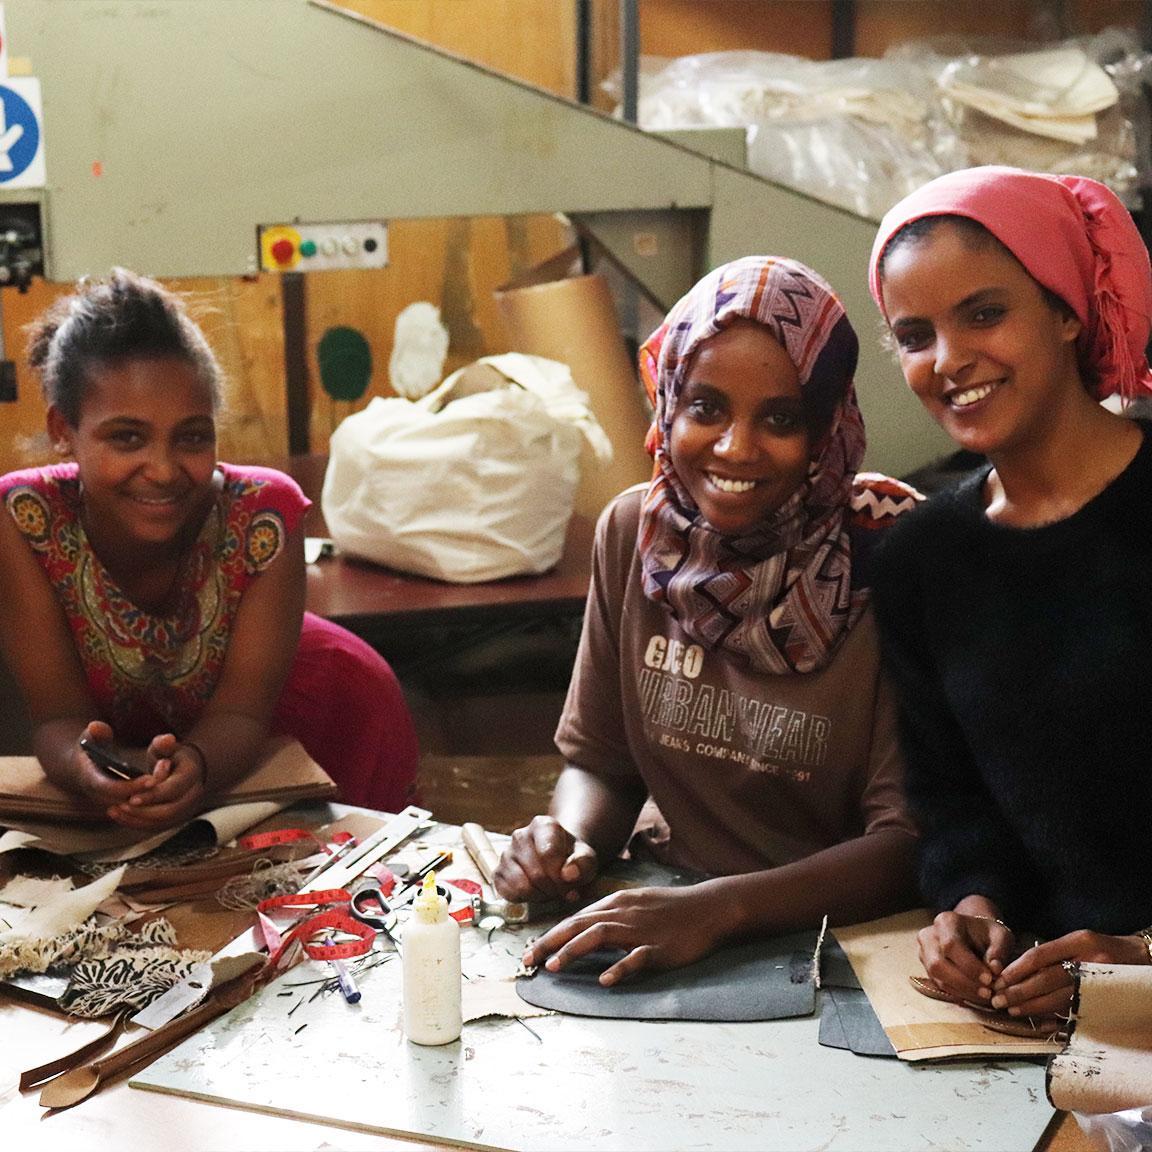 Podcast, Village Industries, AFAR, FairTradio, Fair Trade, Social Enterprise